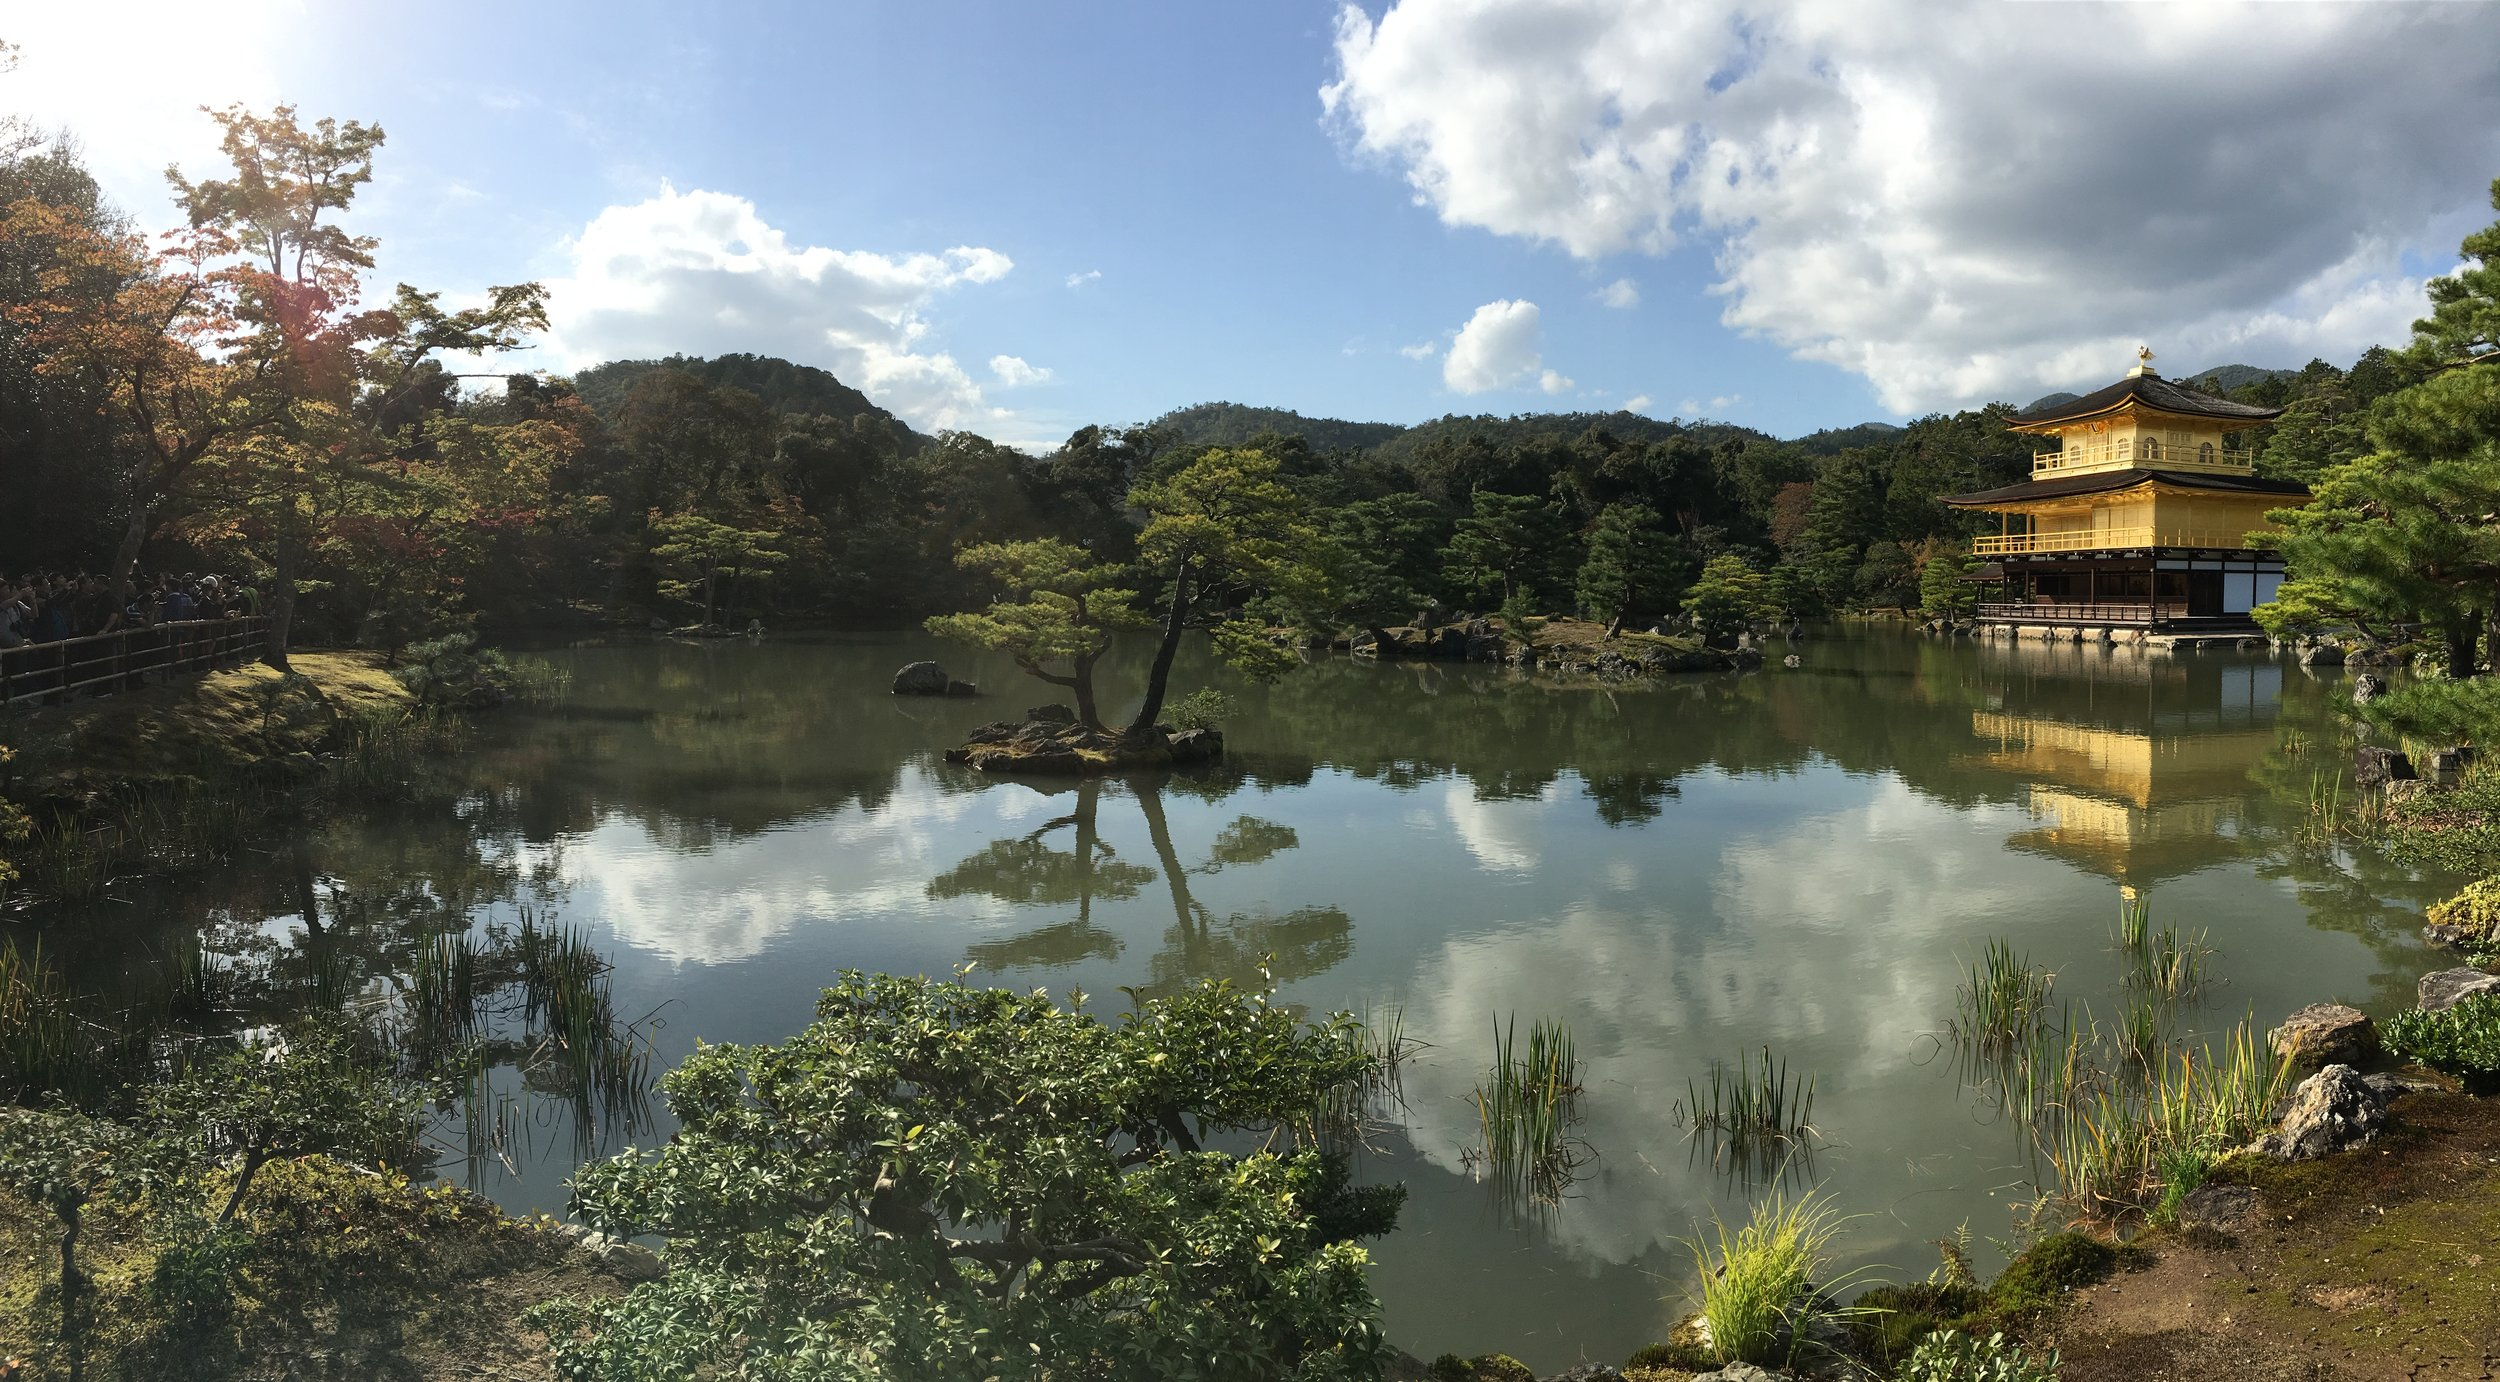 Kinkaku-ji (The Golden Pavilion), Kyoto, Japan